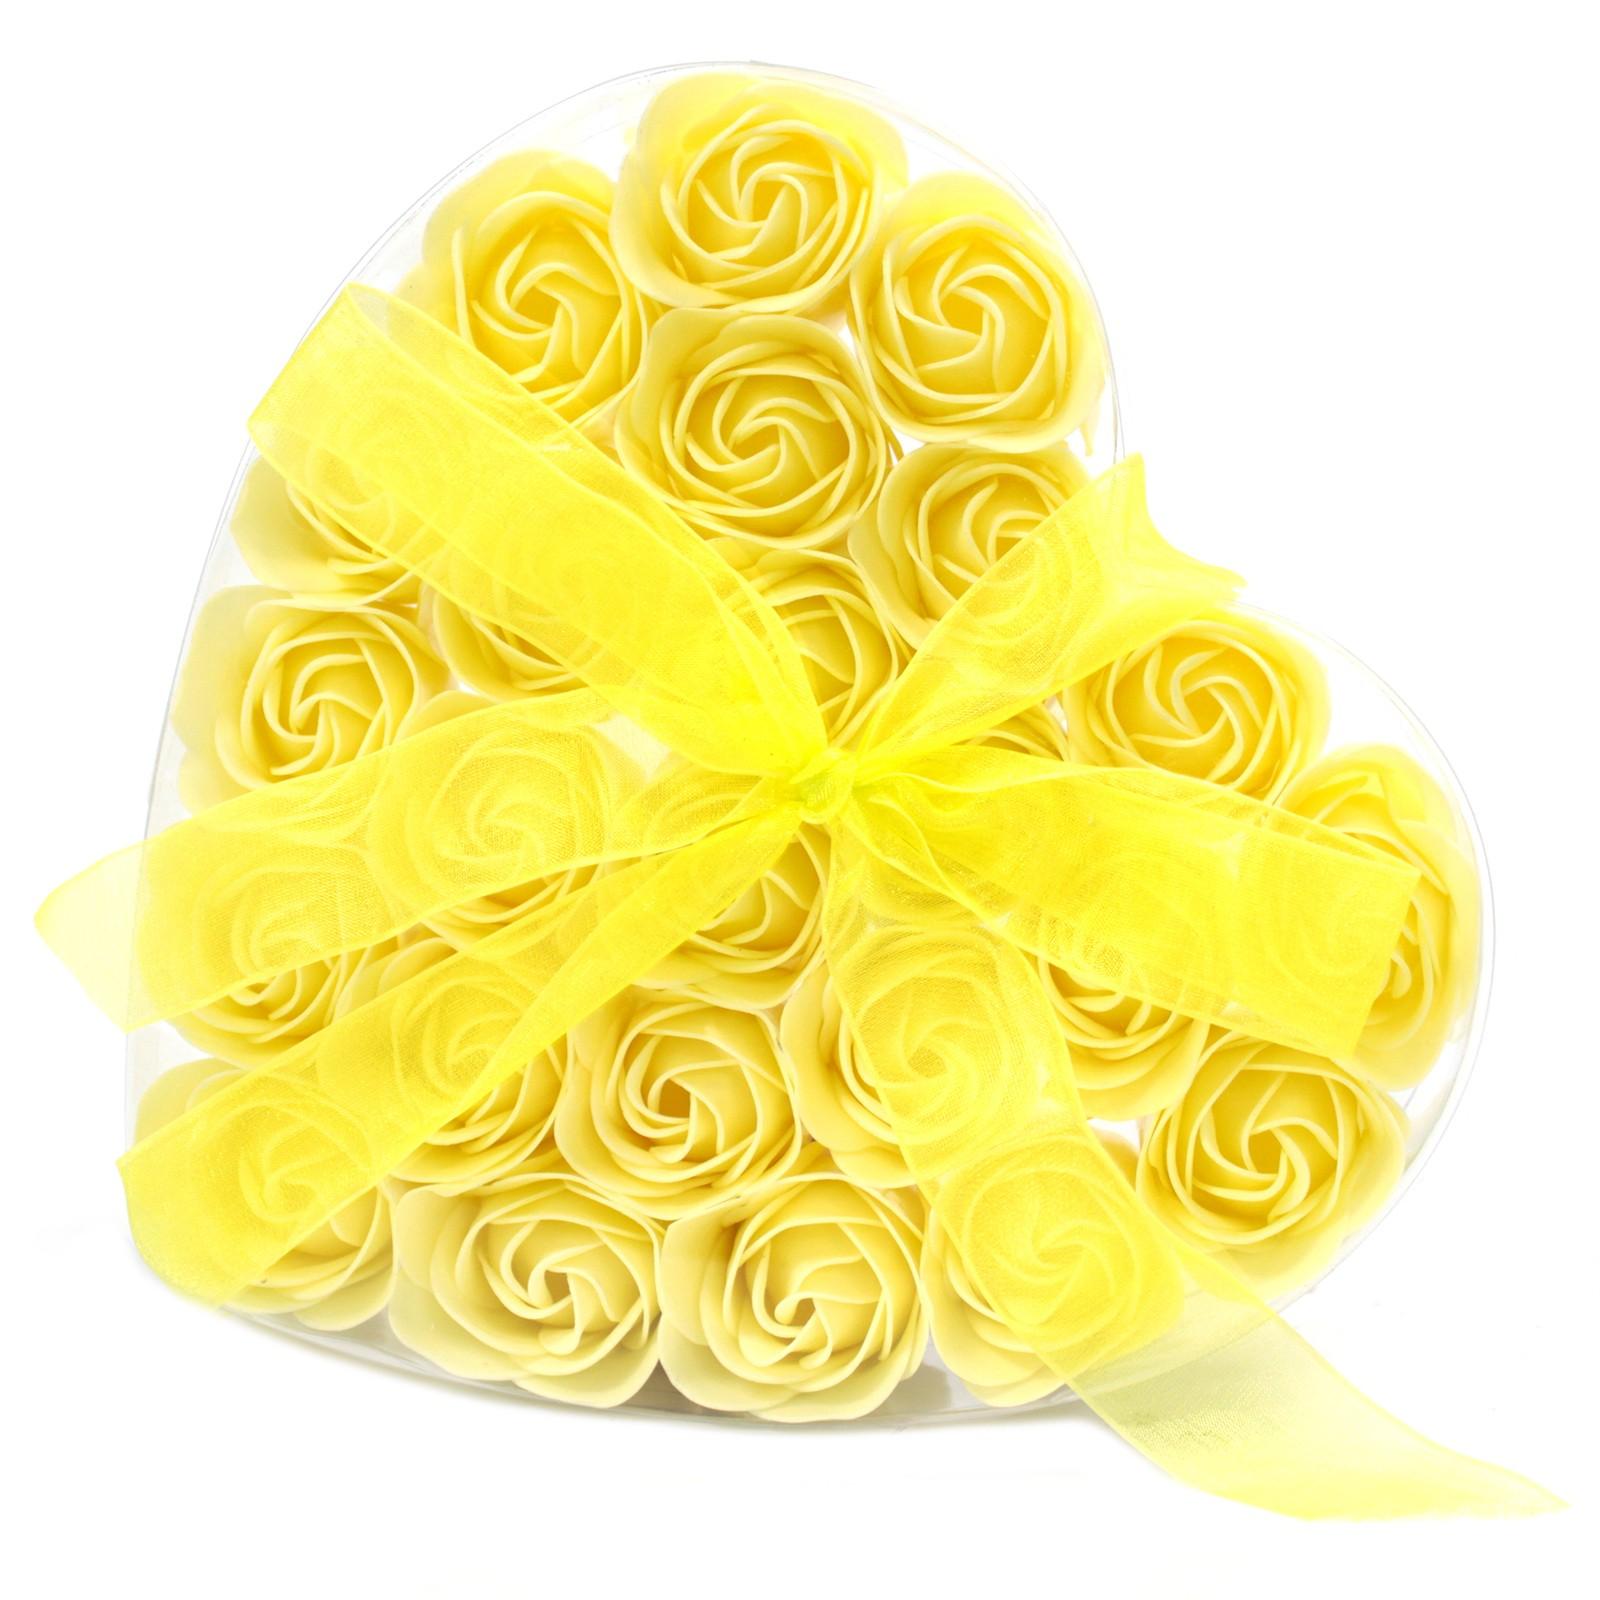 Set of 24 Soap Flower Heart Box Yellow Roses